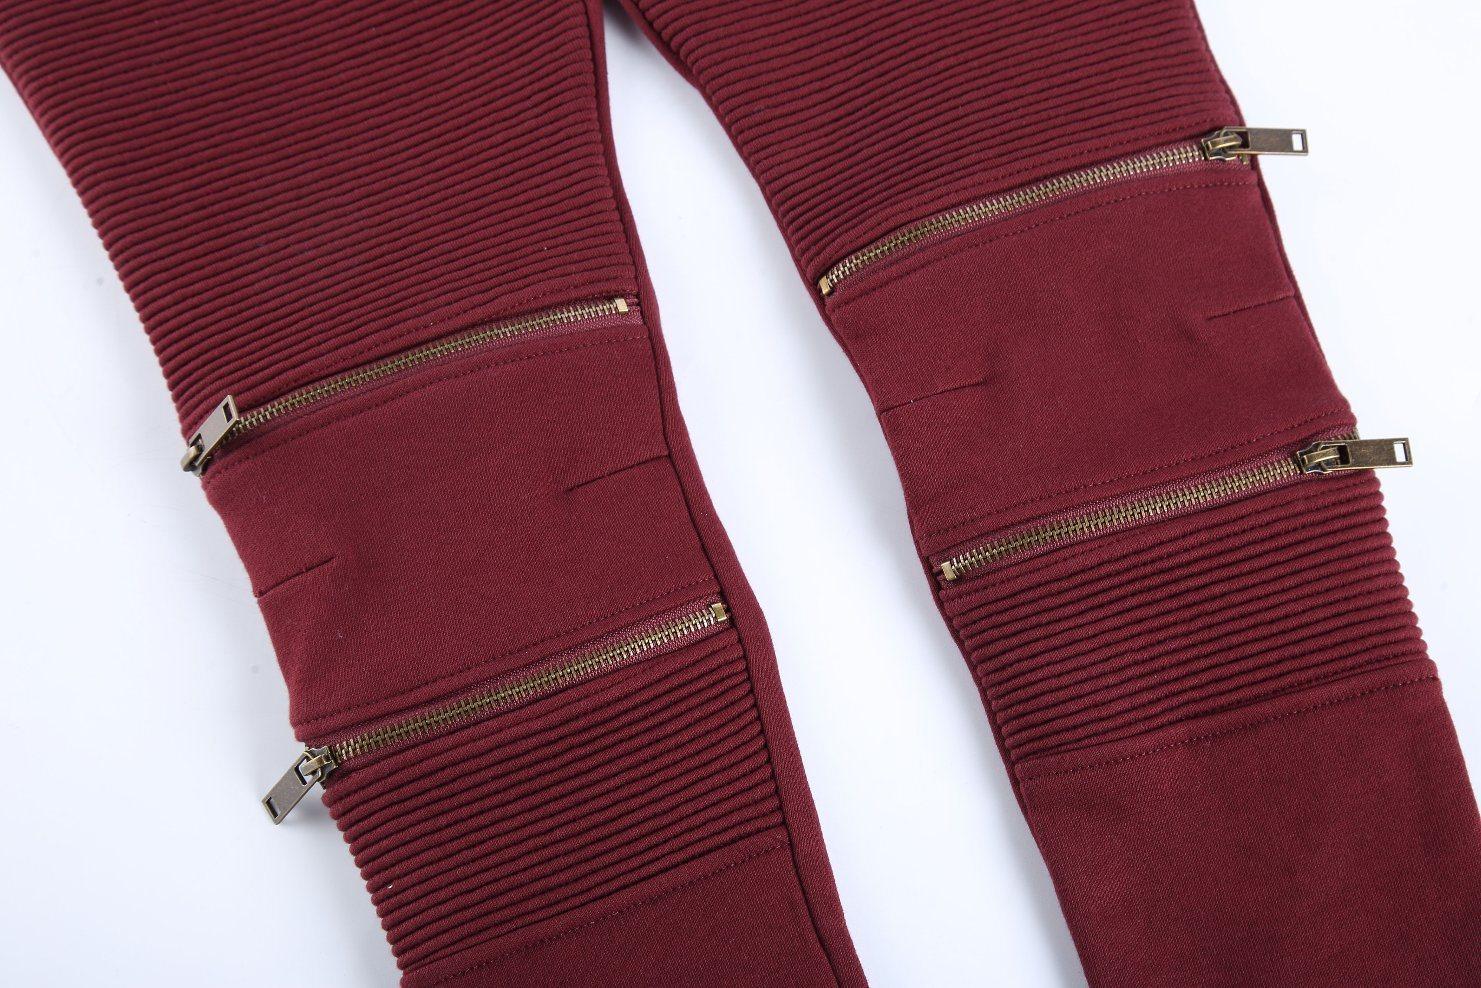 Cotton Terry Spring /Autumn Men Pants